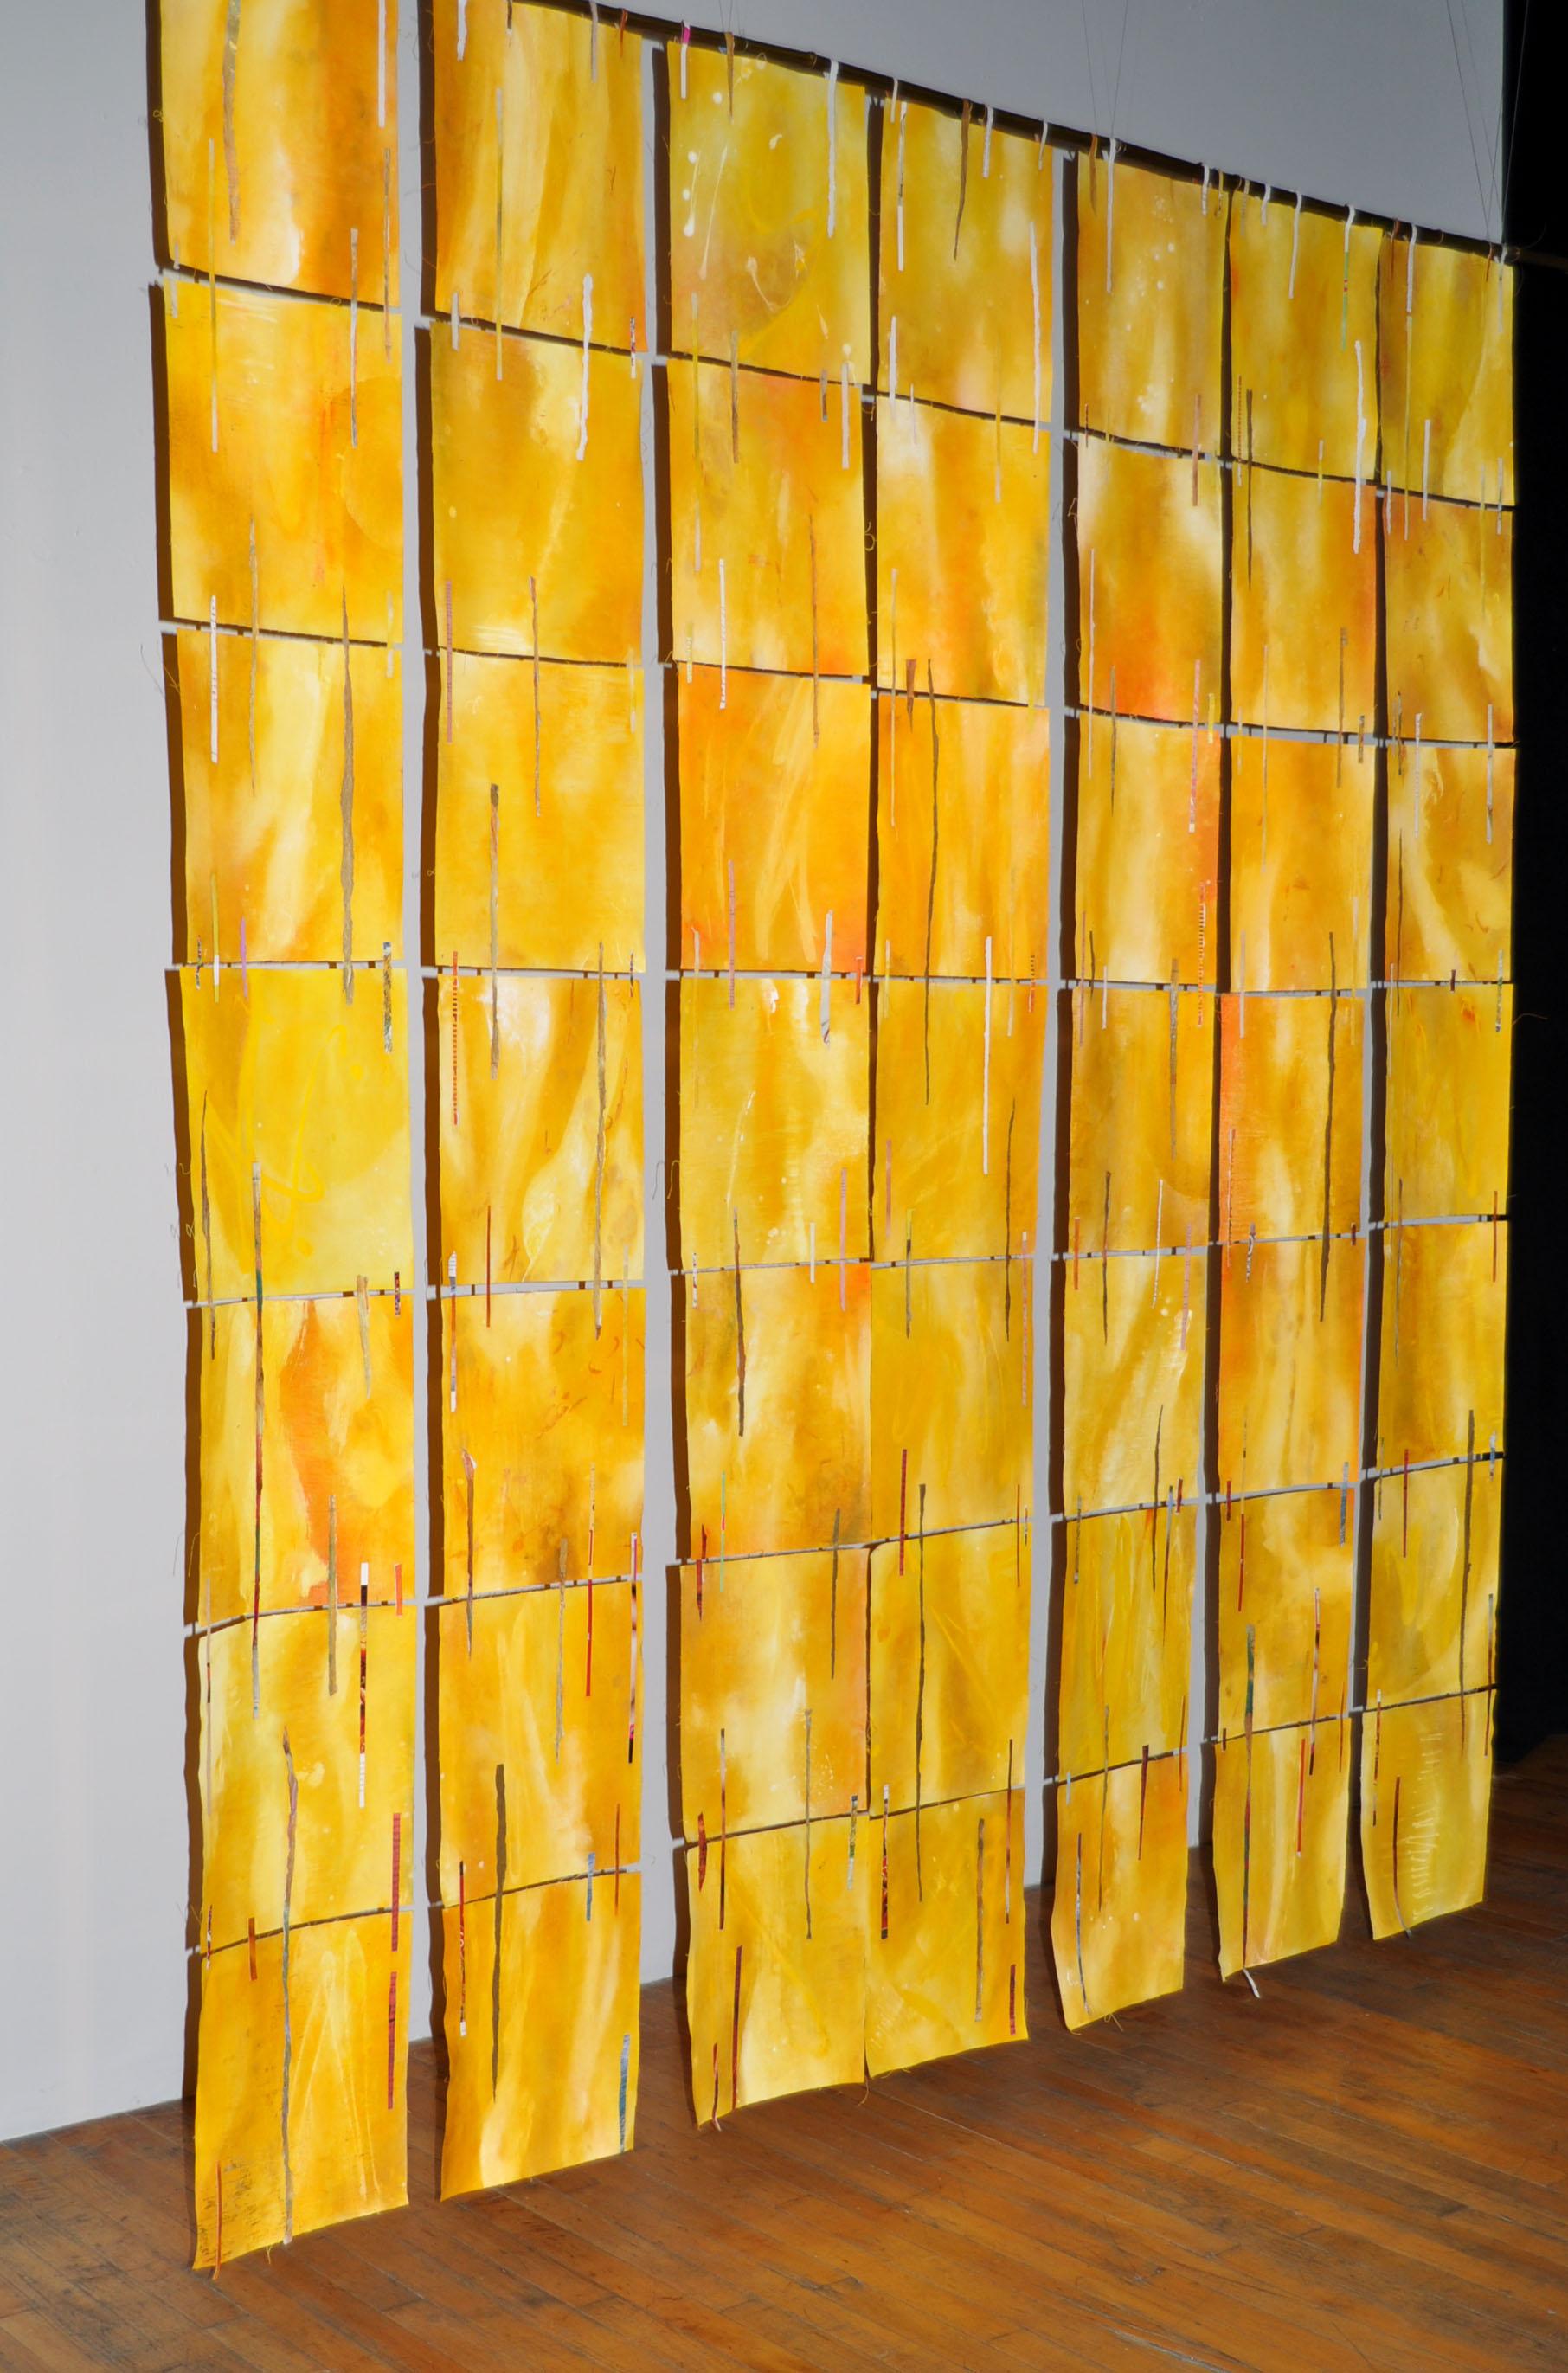 49 yellow squares